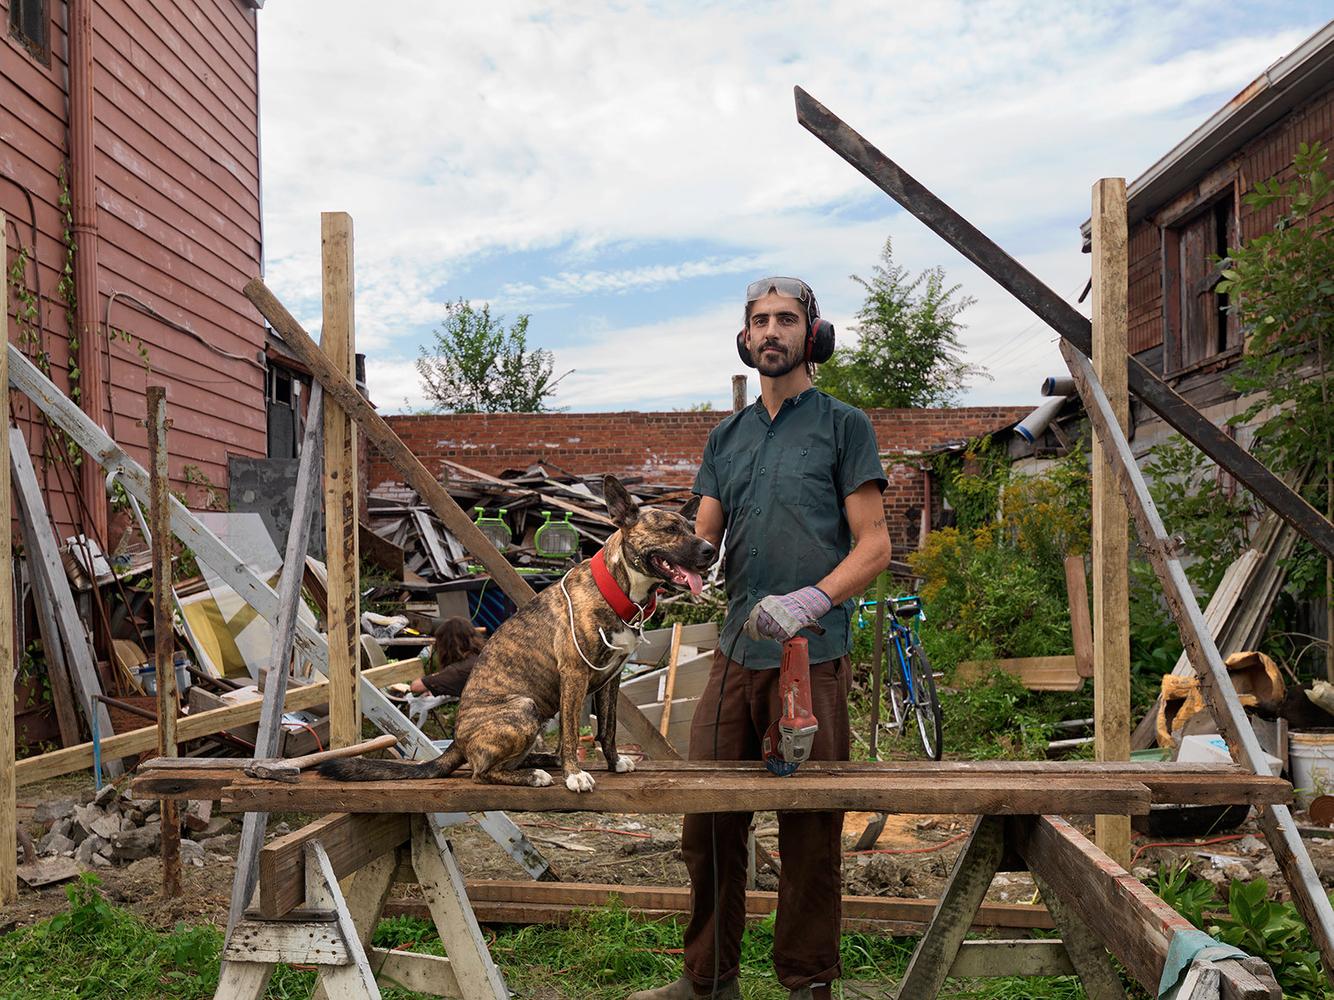 Ben Working on His New Building, Chene Street, Poletown, Detroit 2014